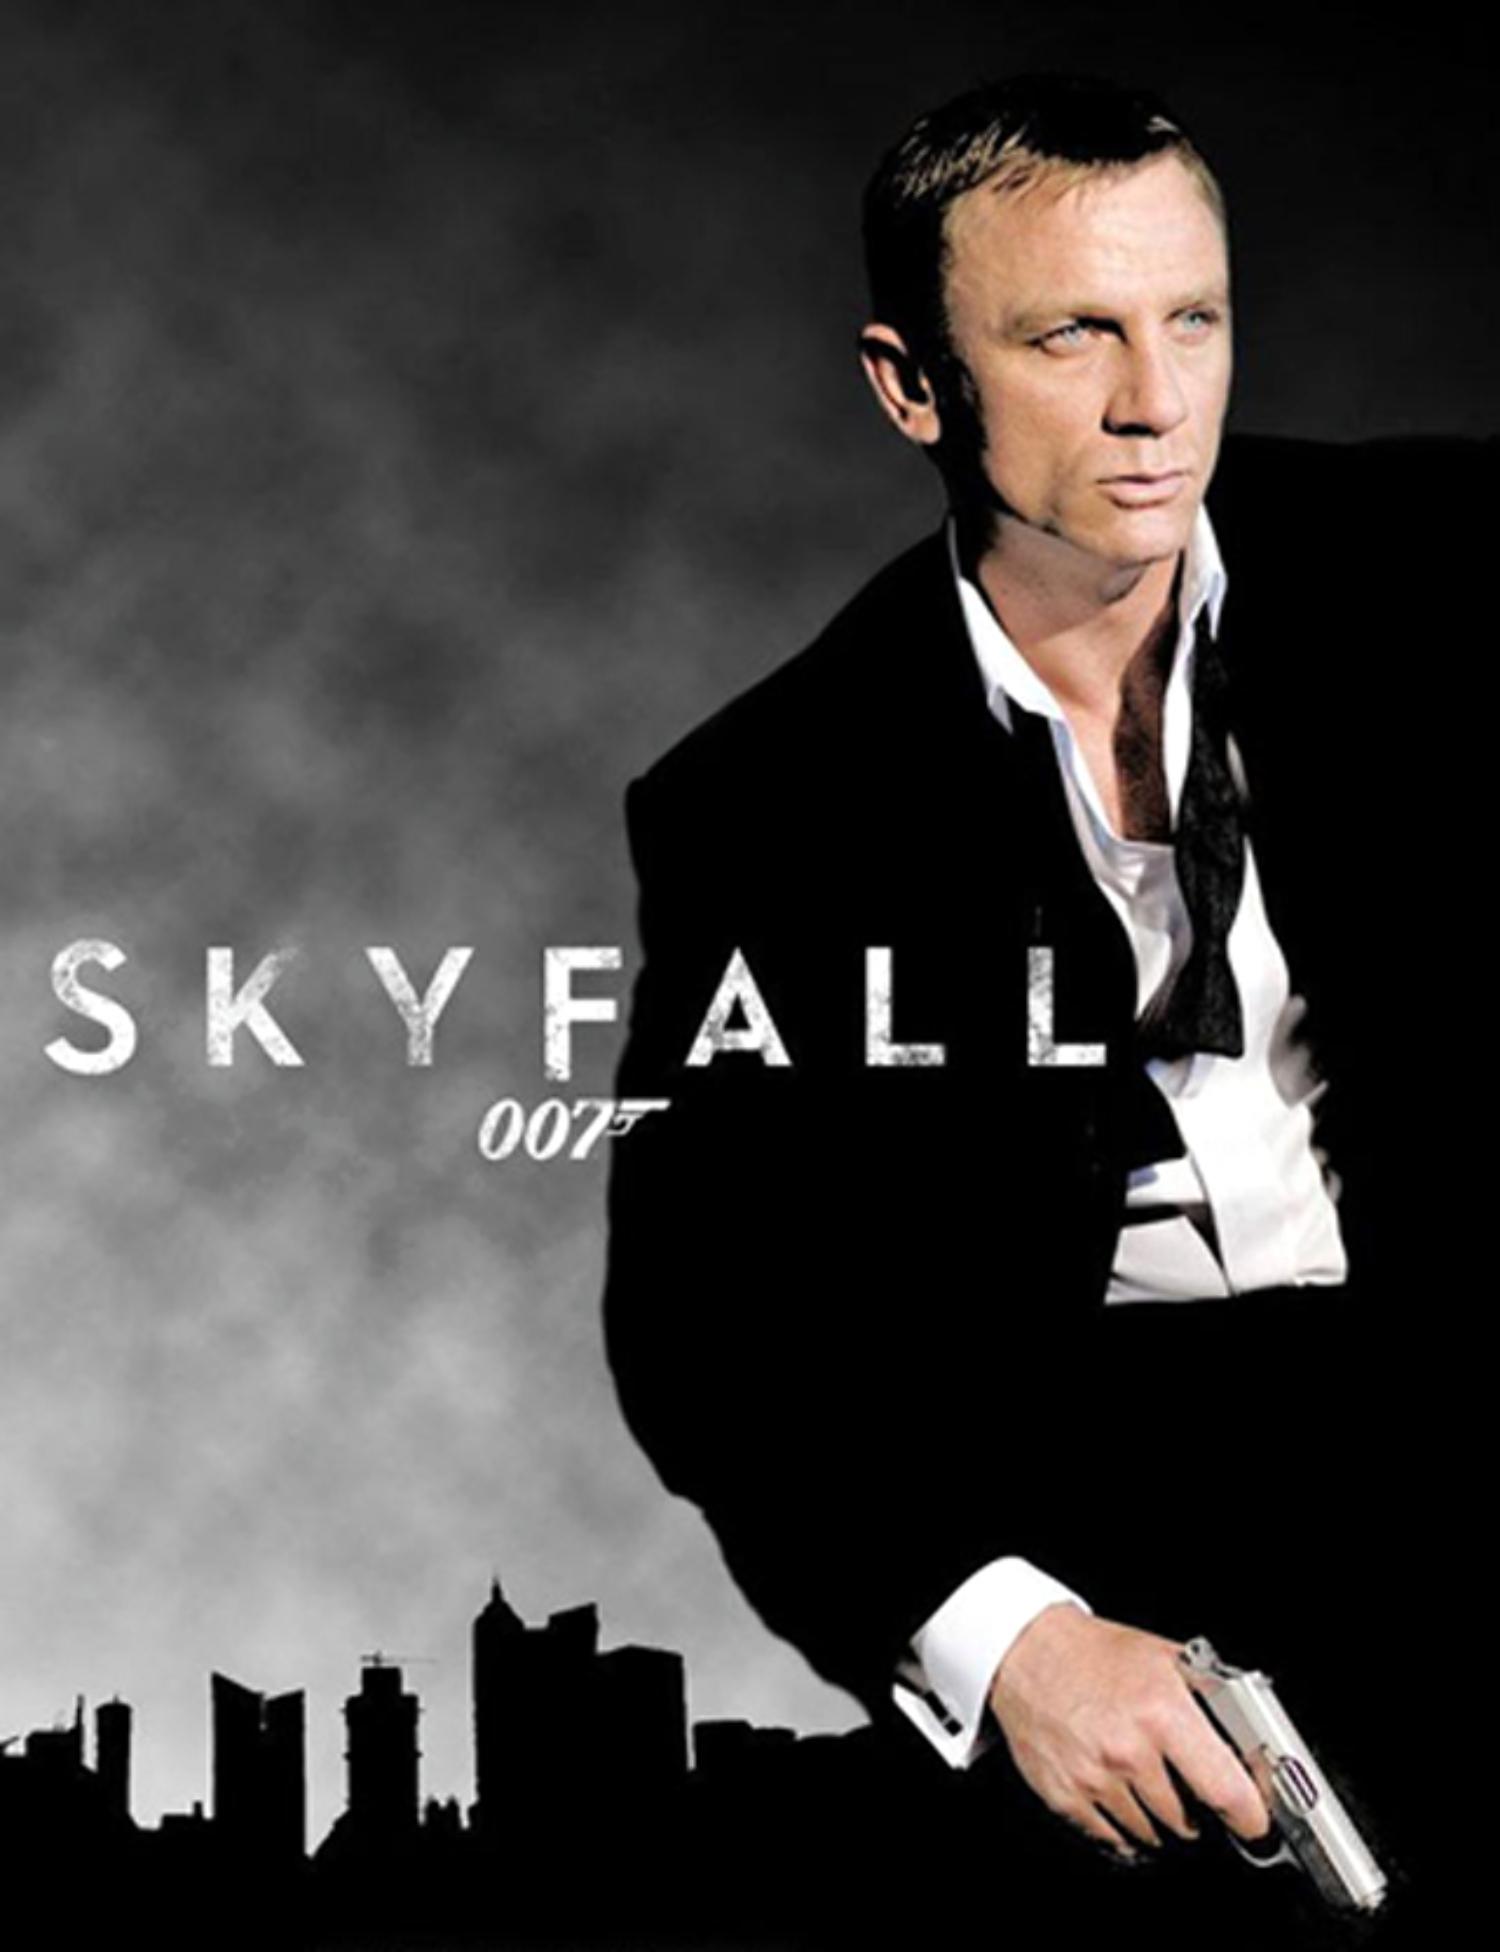 Daniel craig as james bond skyfall movie wallpaper - Daniel craig bond wallpaper ...